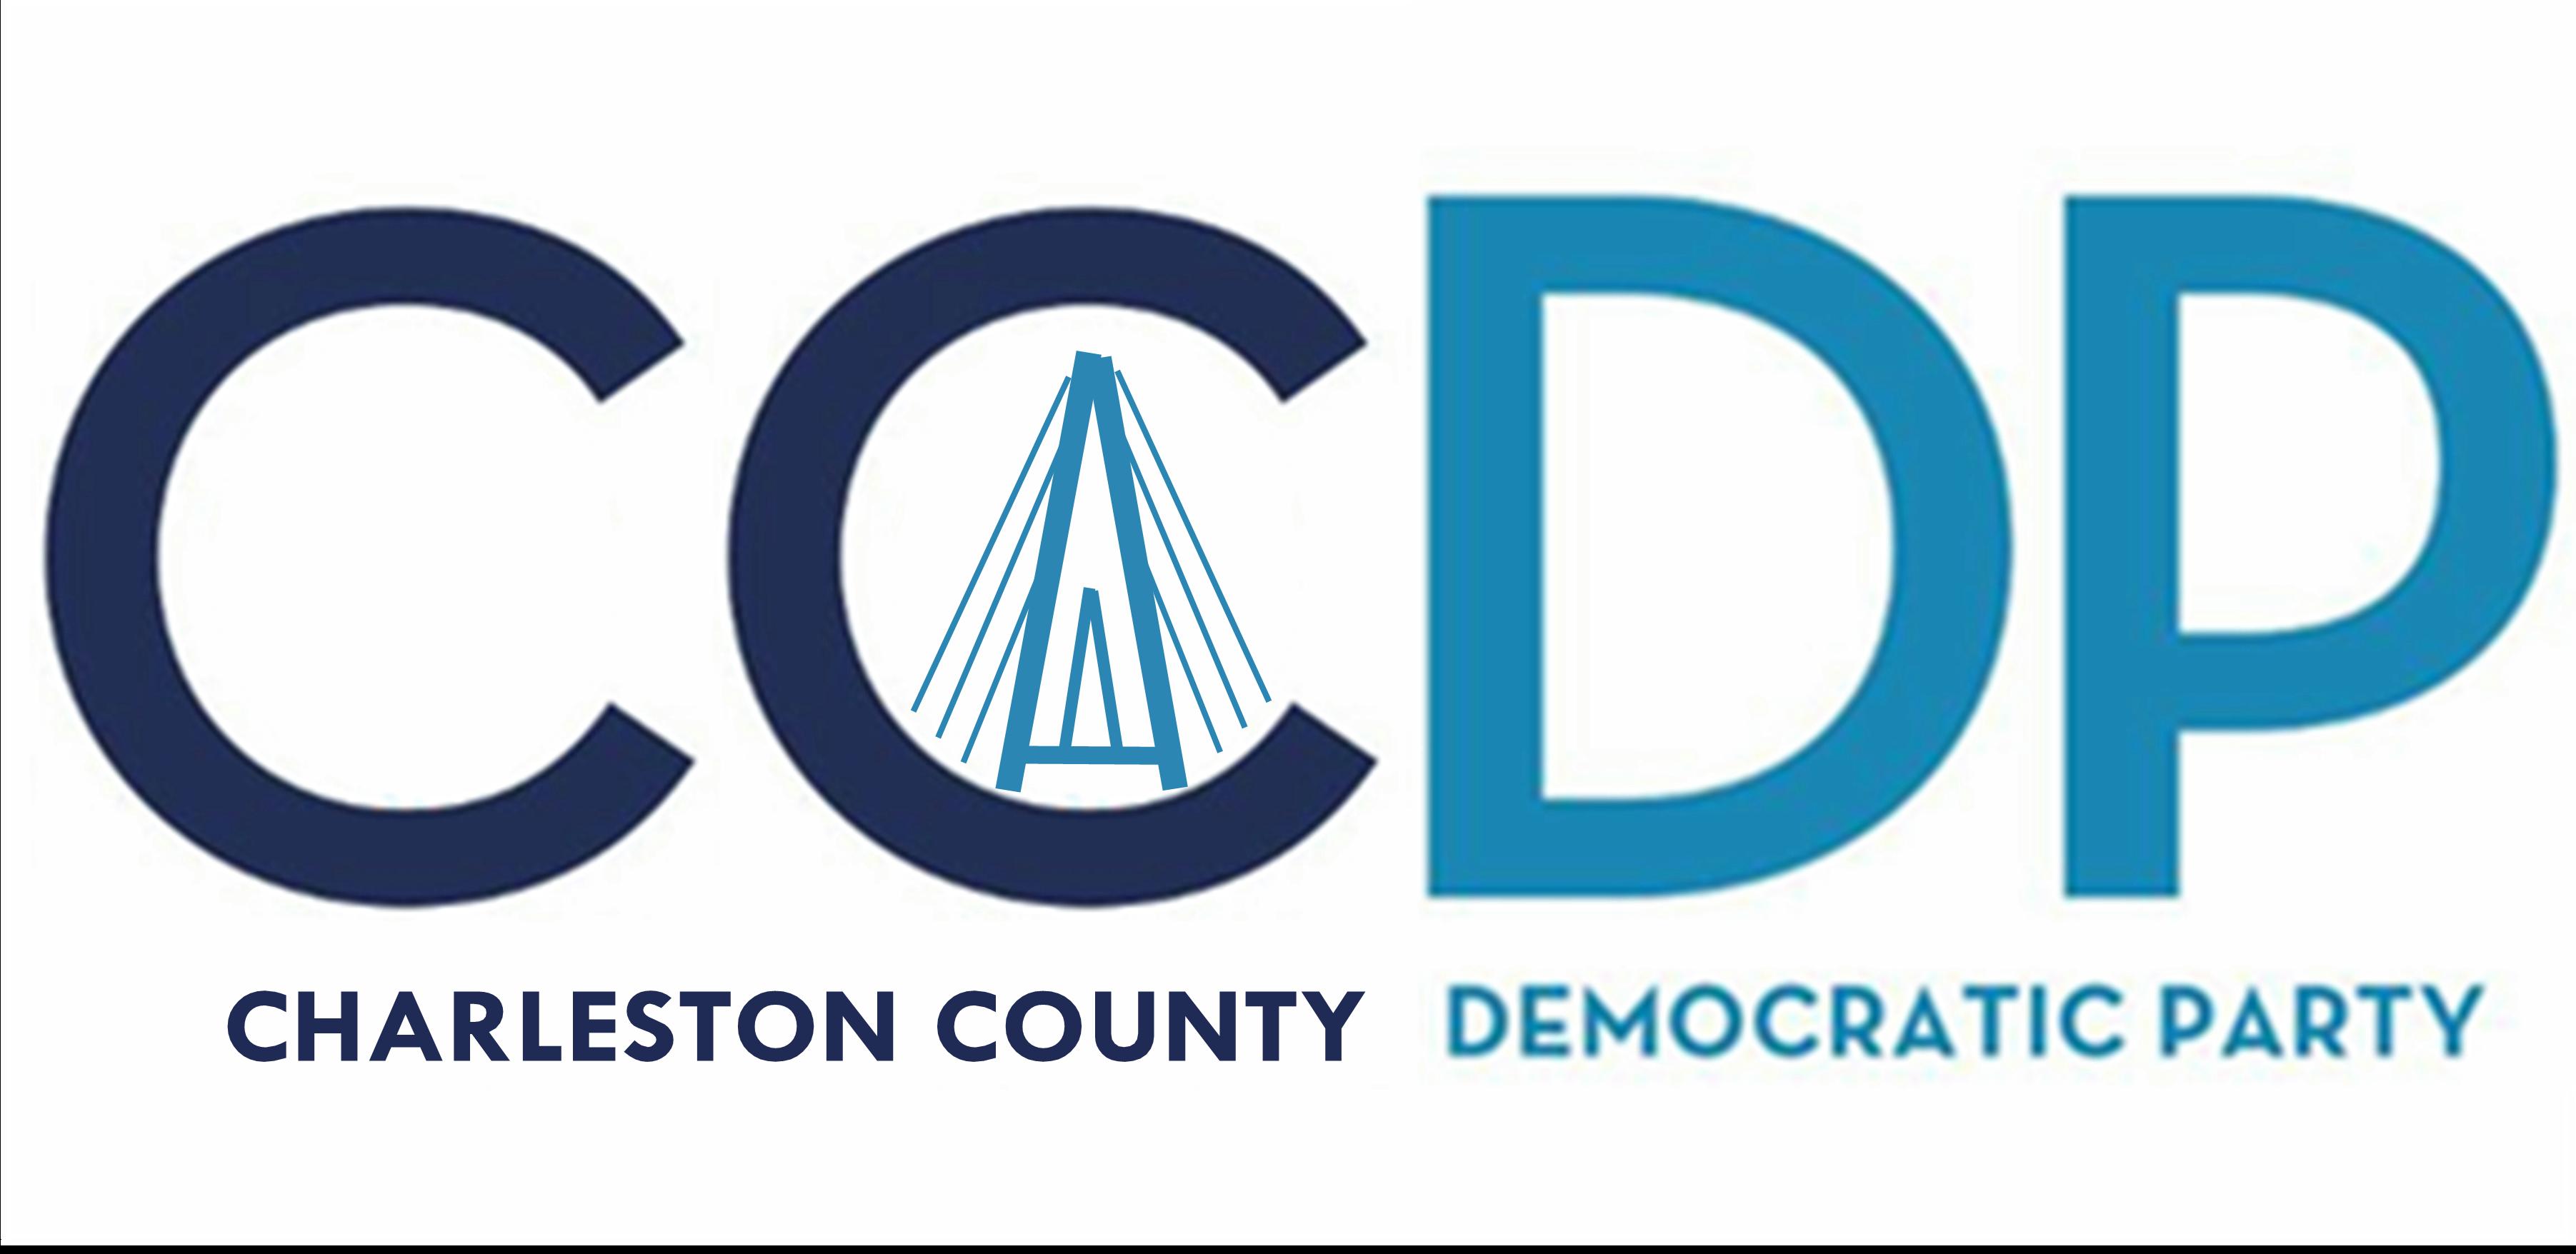 Charleston County Democratic Party (SC)